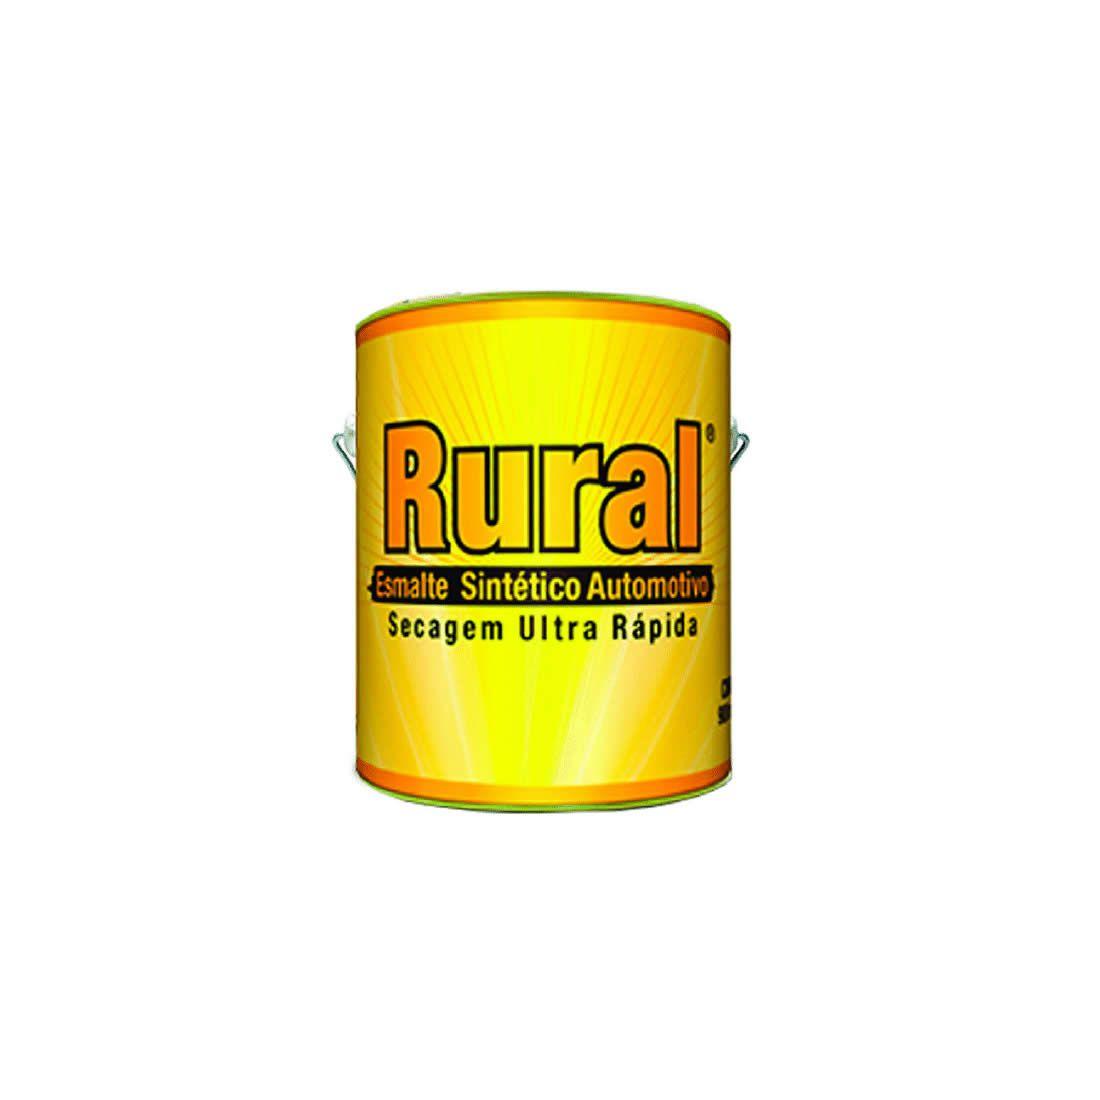 Esmalte Sintético Rural Secagem Ultra Rápido Amarelo Claro New Holland 6104 3,6Lt